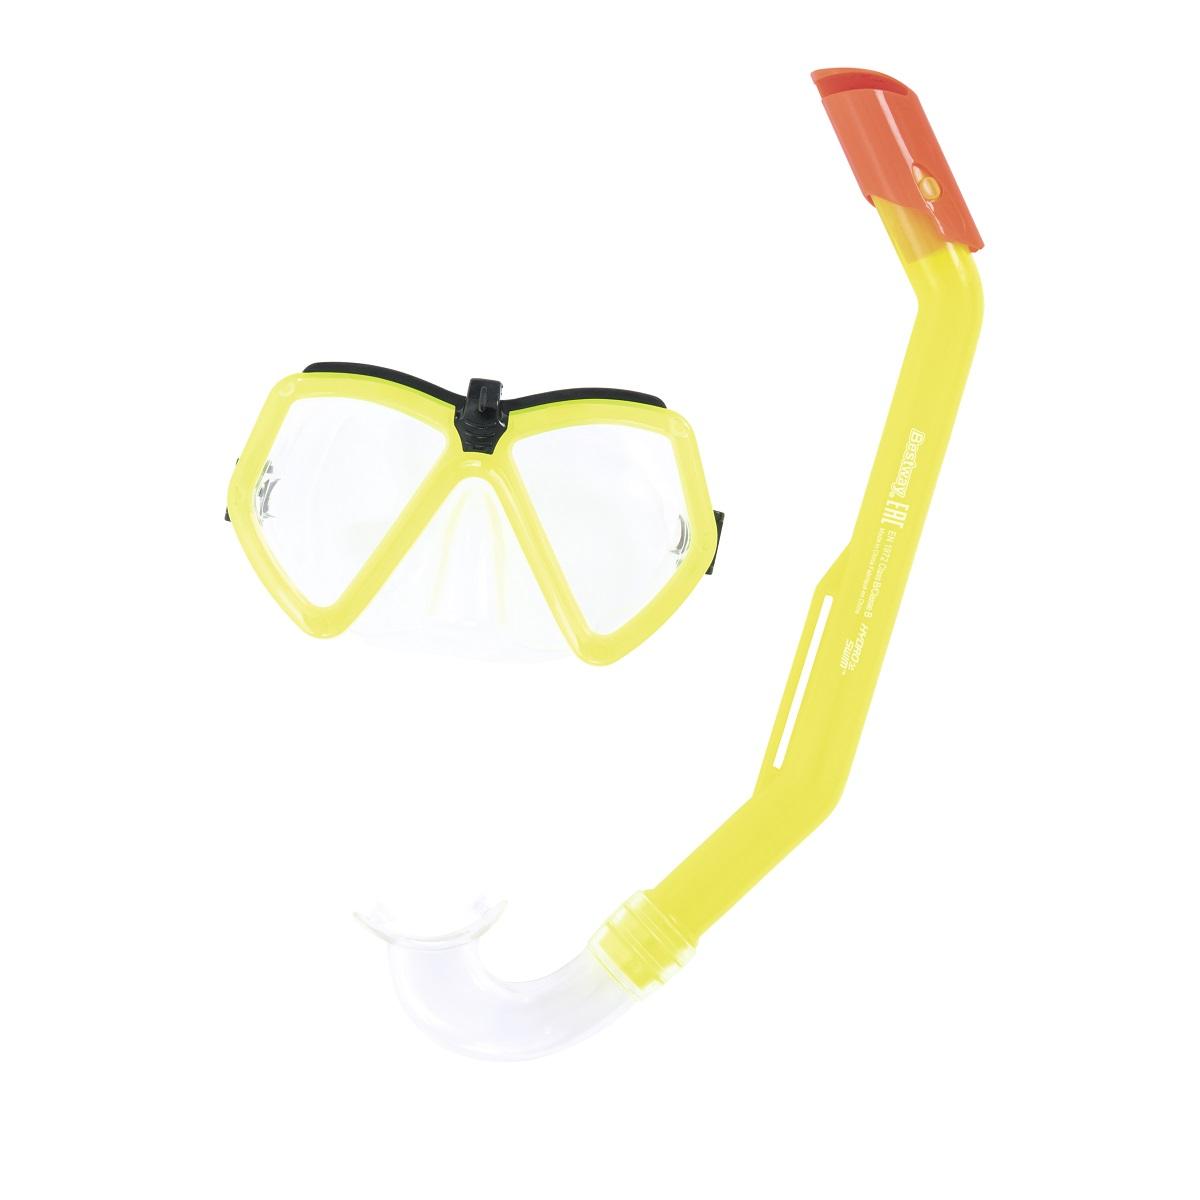 Potápěčský set BESTWAY Hydro Swim 24027 - žlutý